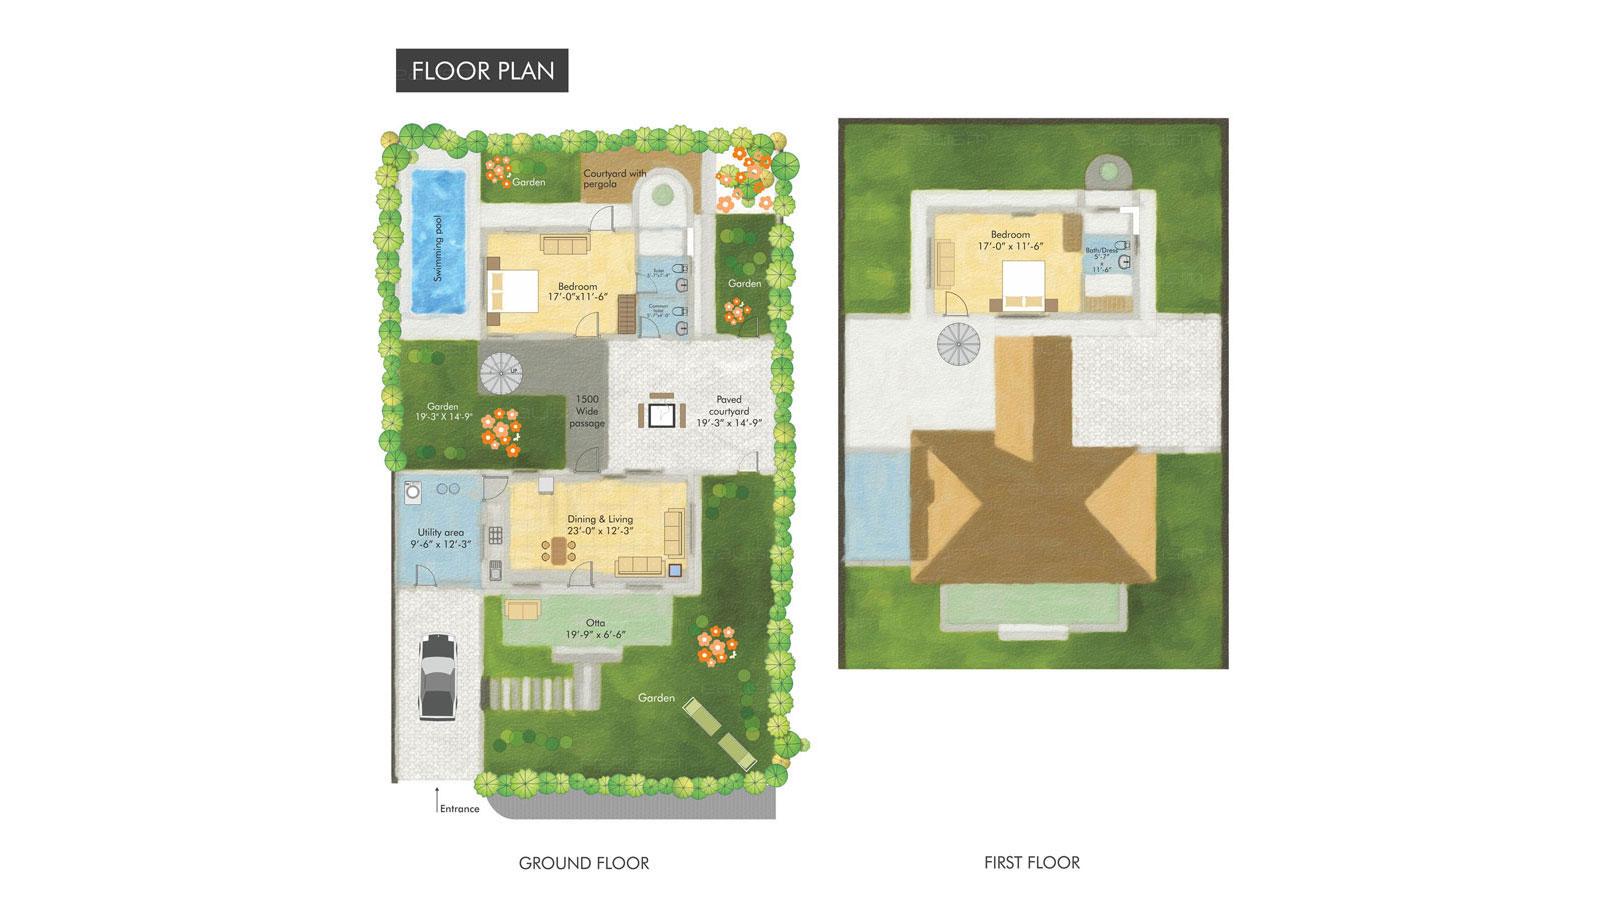 Realism 2d Floor Plans 3d Floor Plans Landscaping Ahmedabad Gujarat India